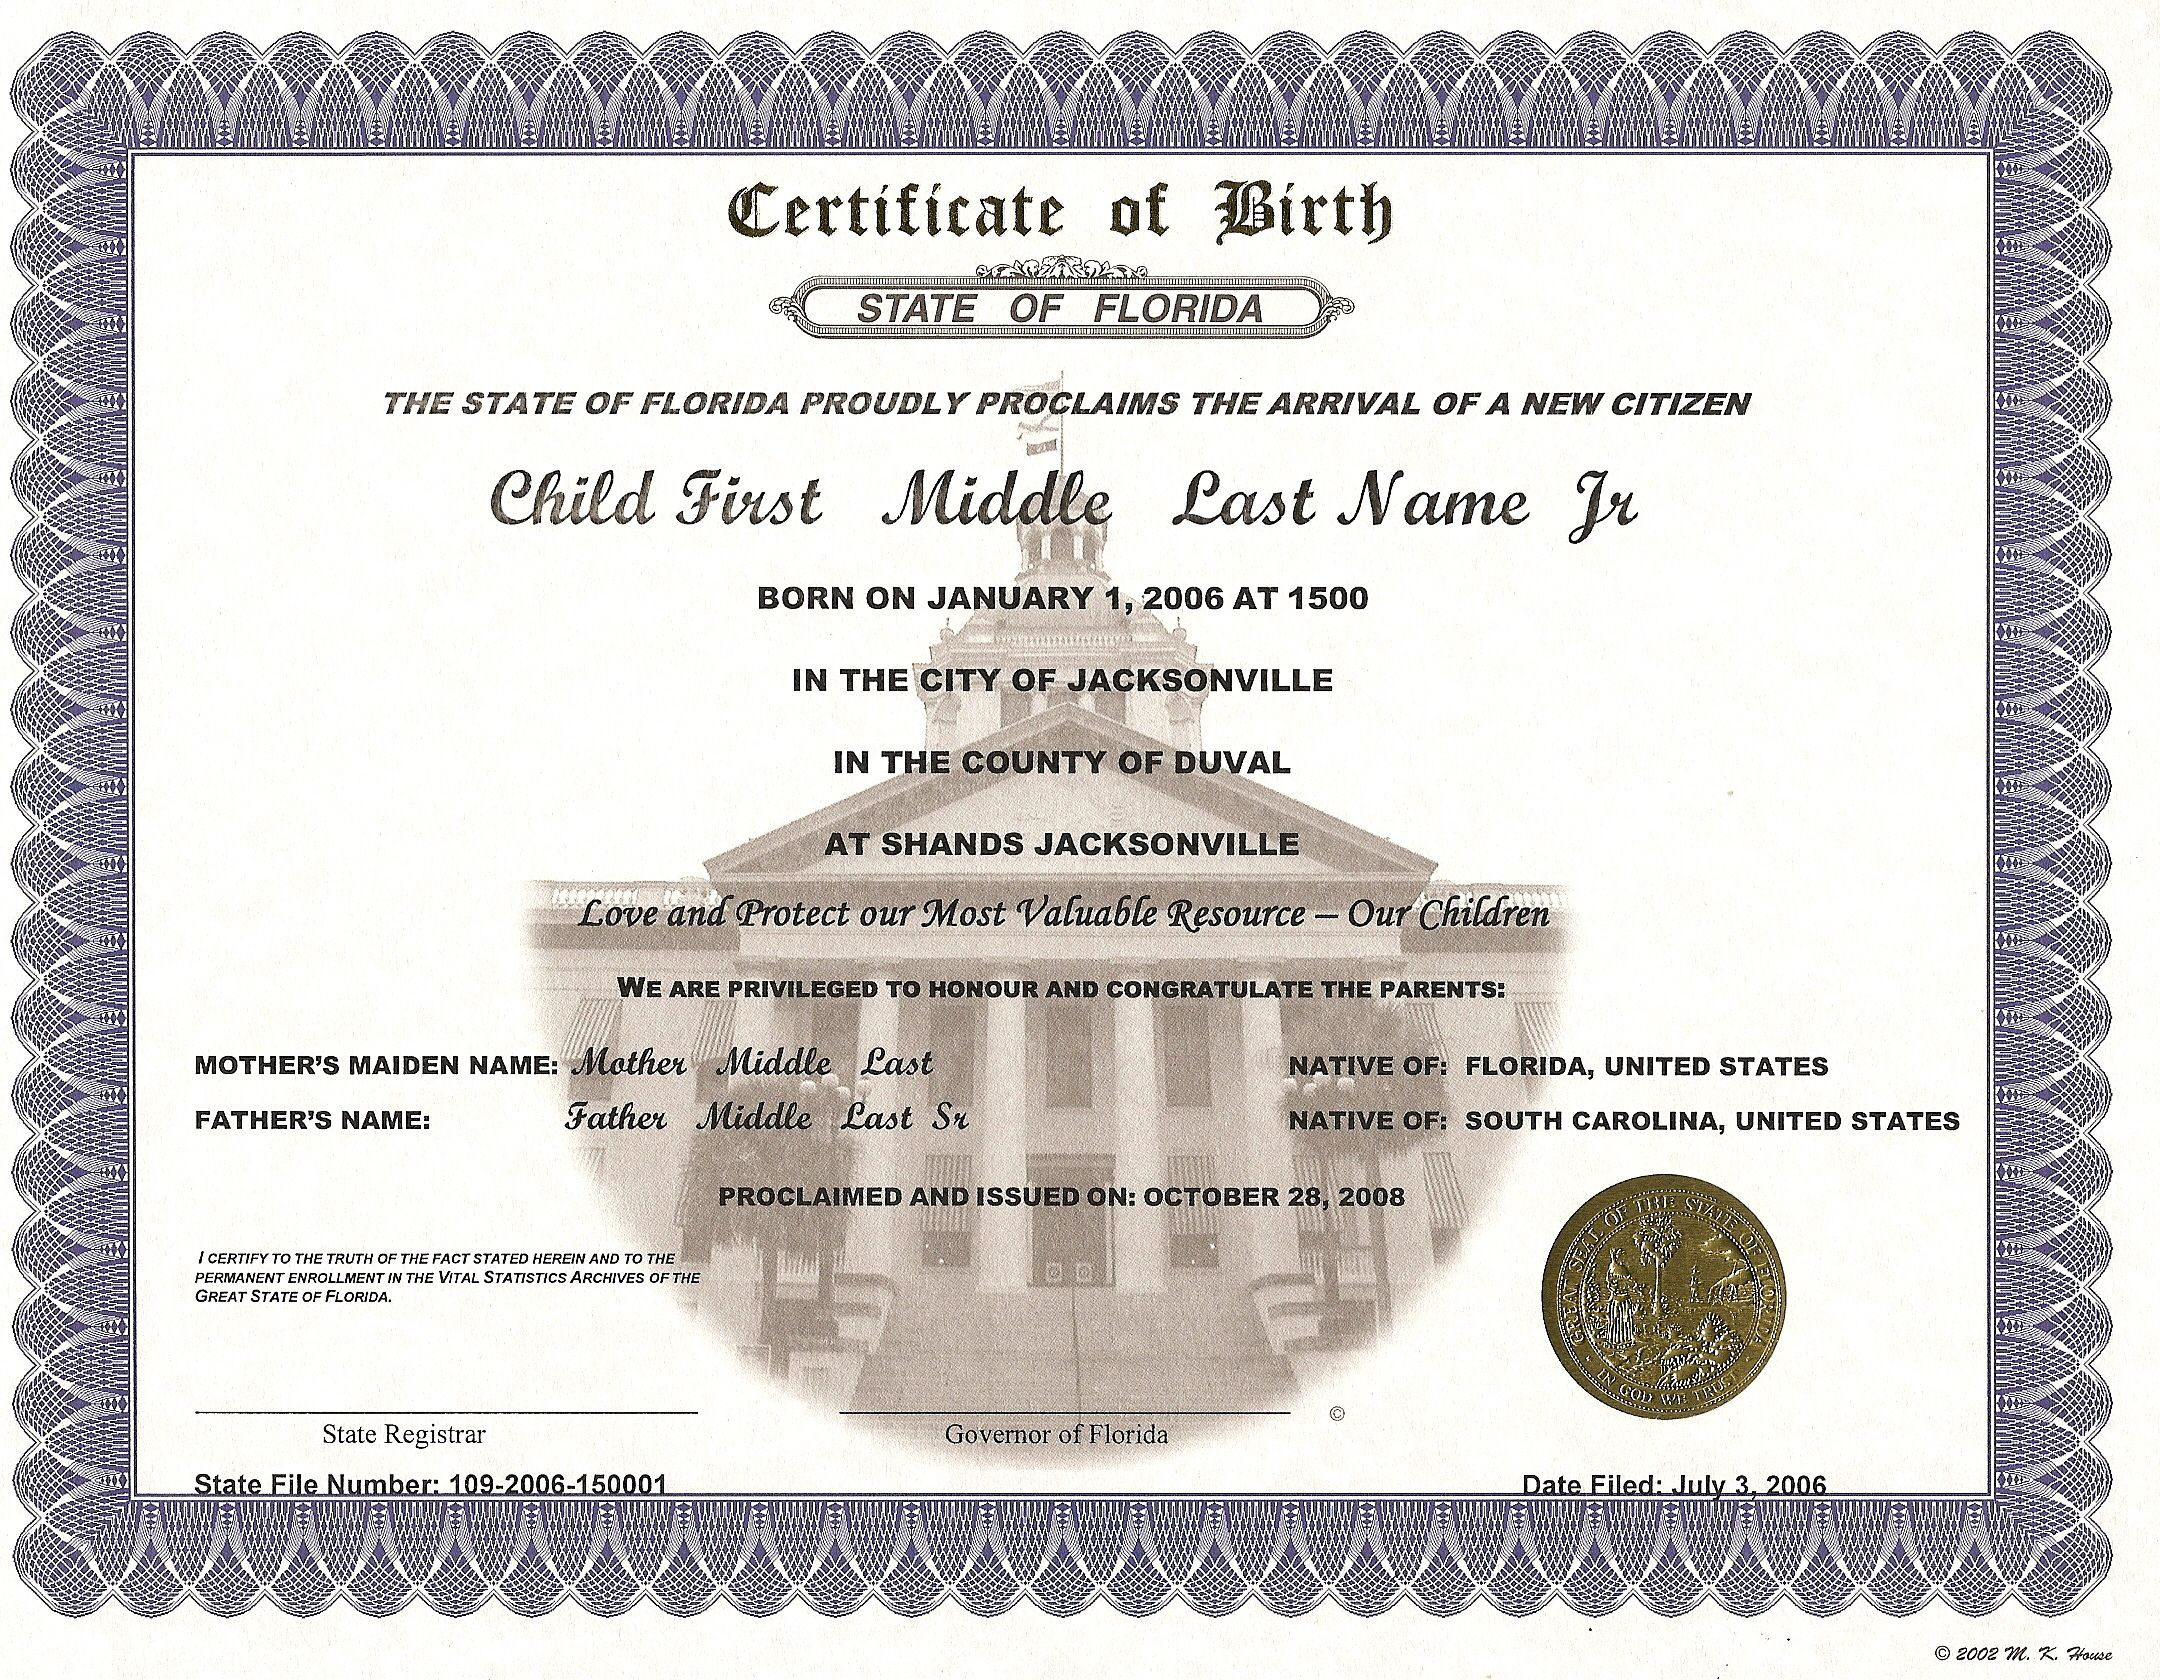 Wisconsin Birth Certificate 1983